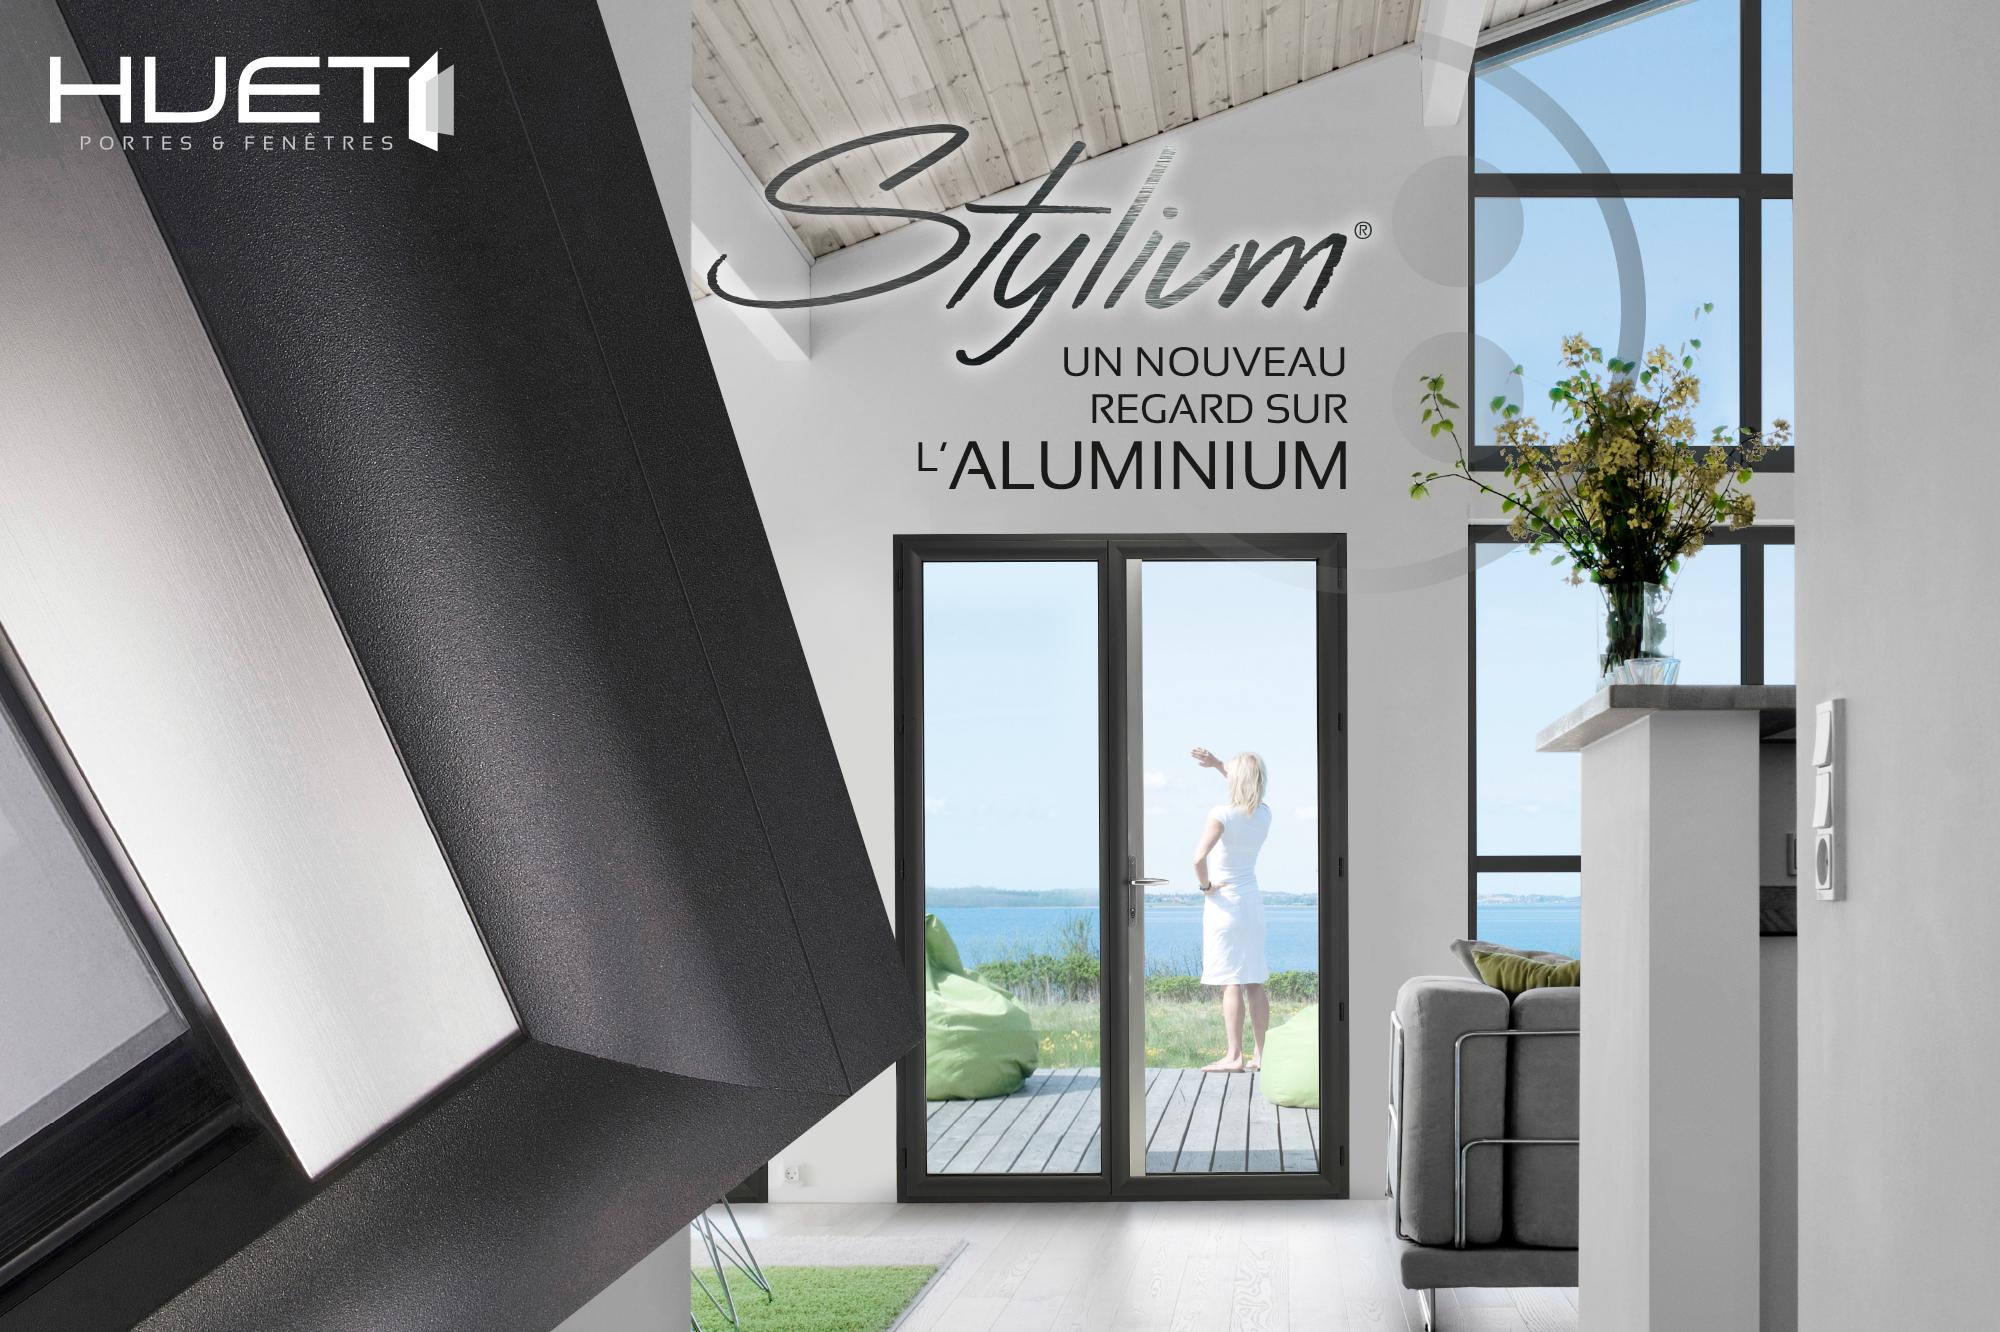 Stylium